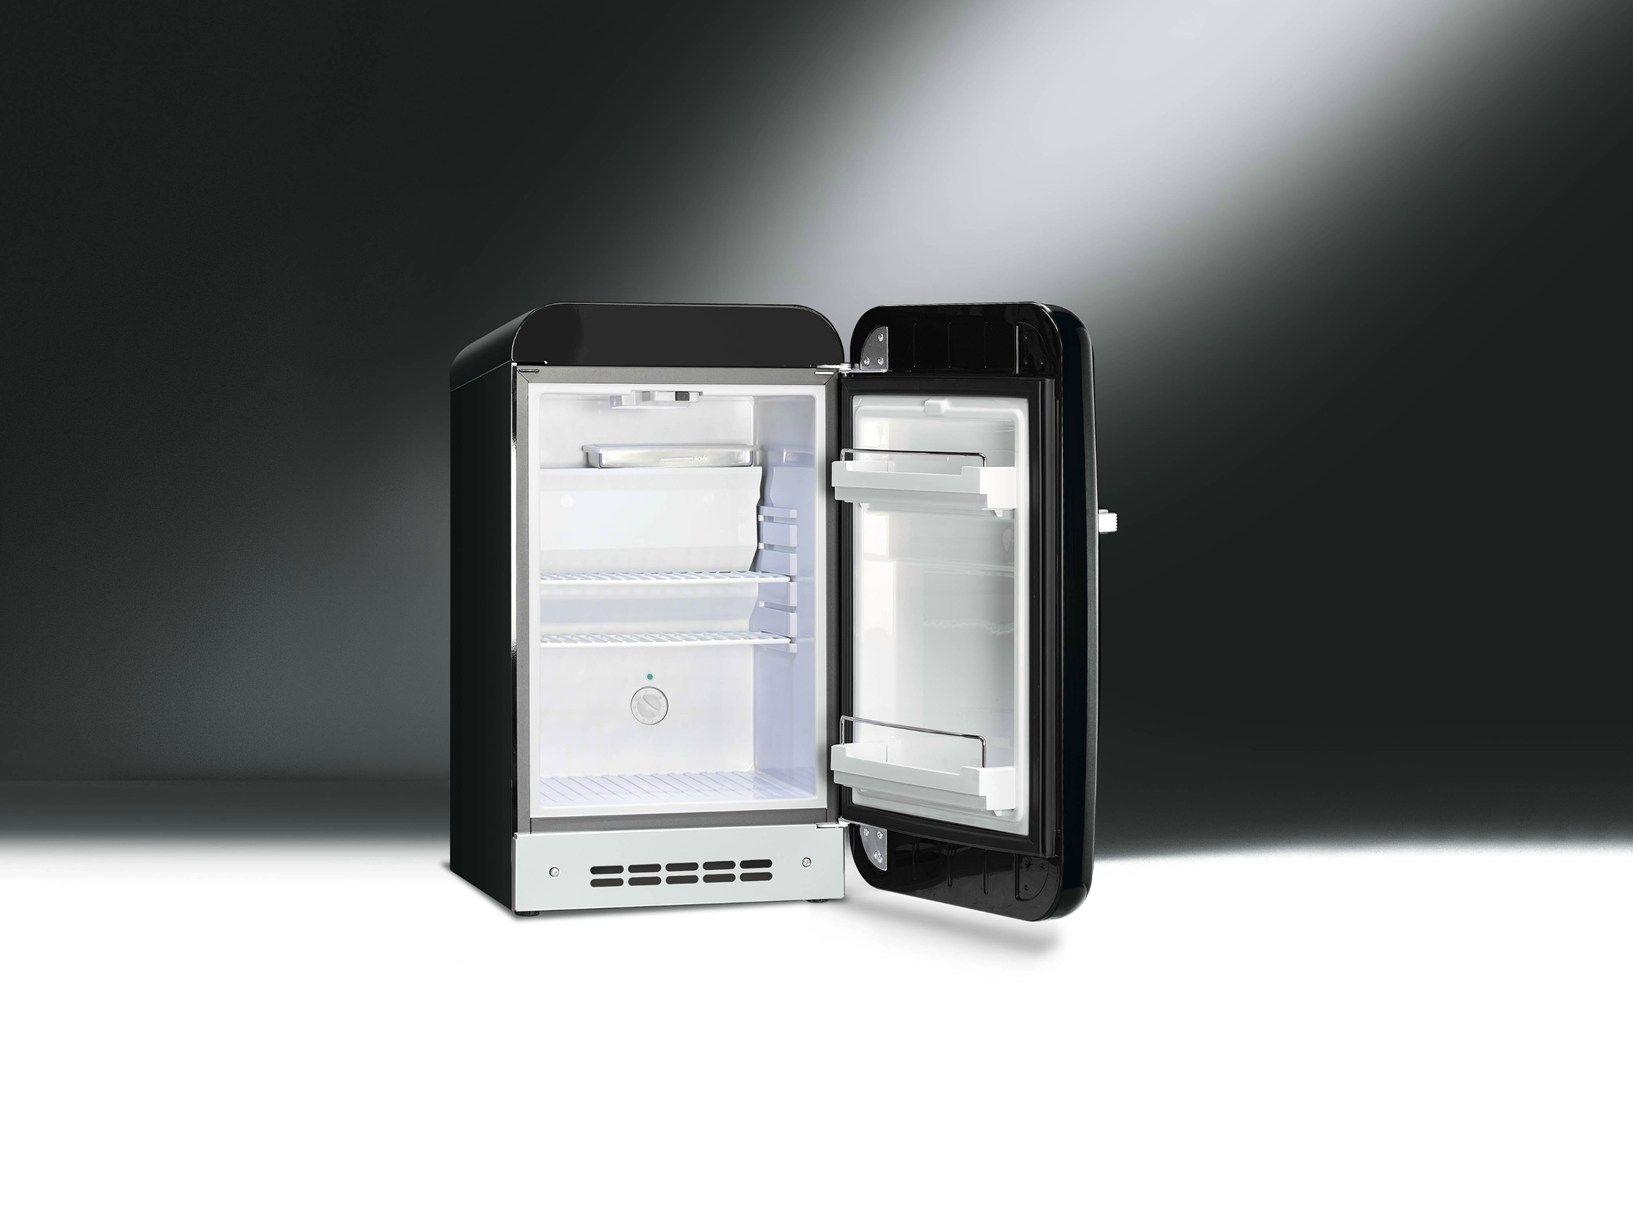 smeg presents new fab5 mini fridge. Black Bedroom Furniture Sets. Home Design Ideas